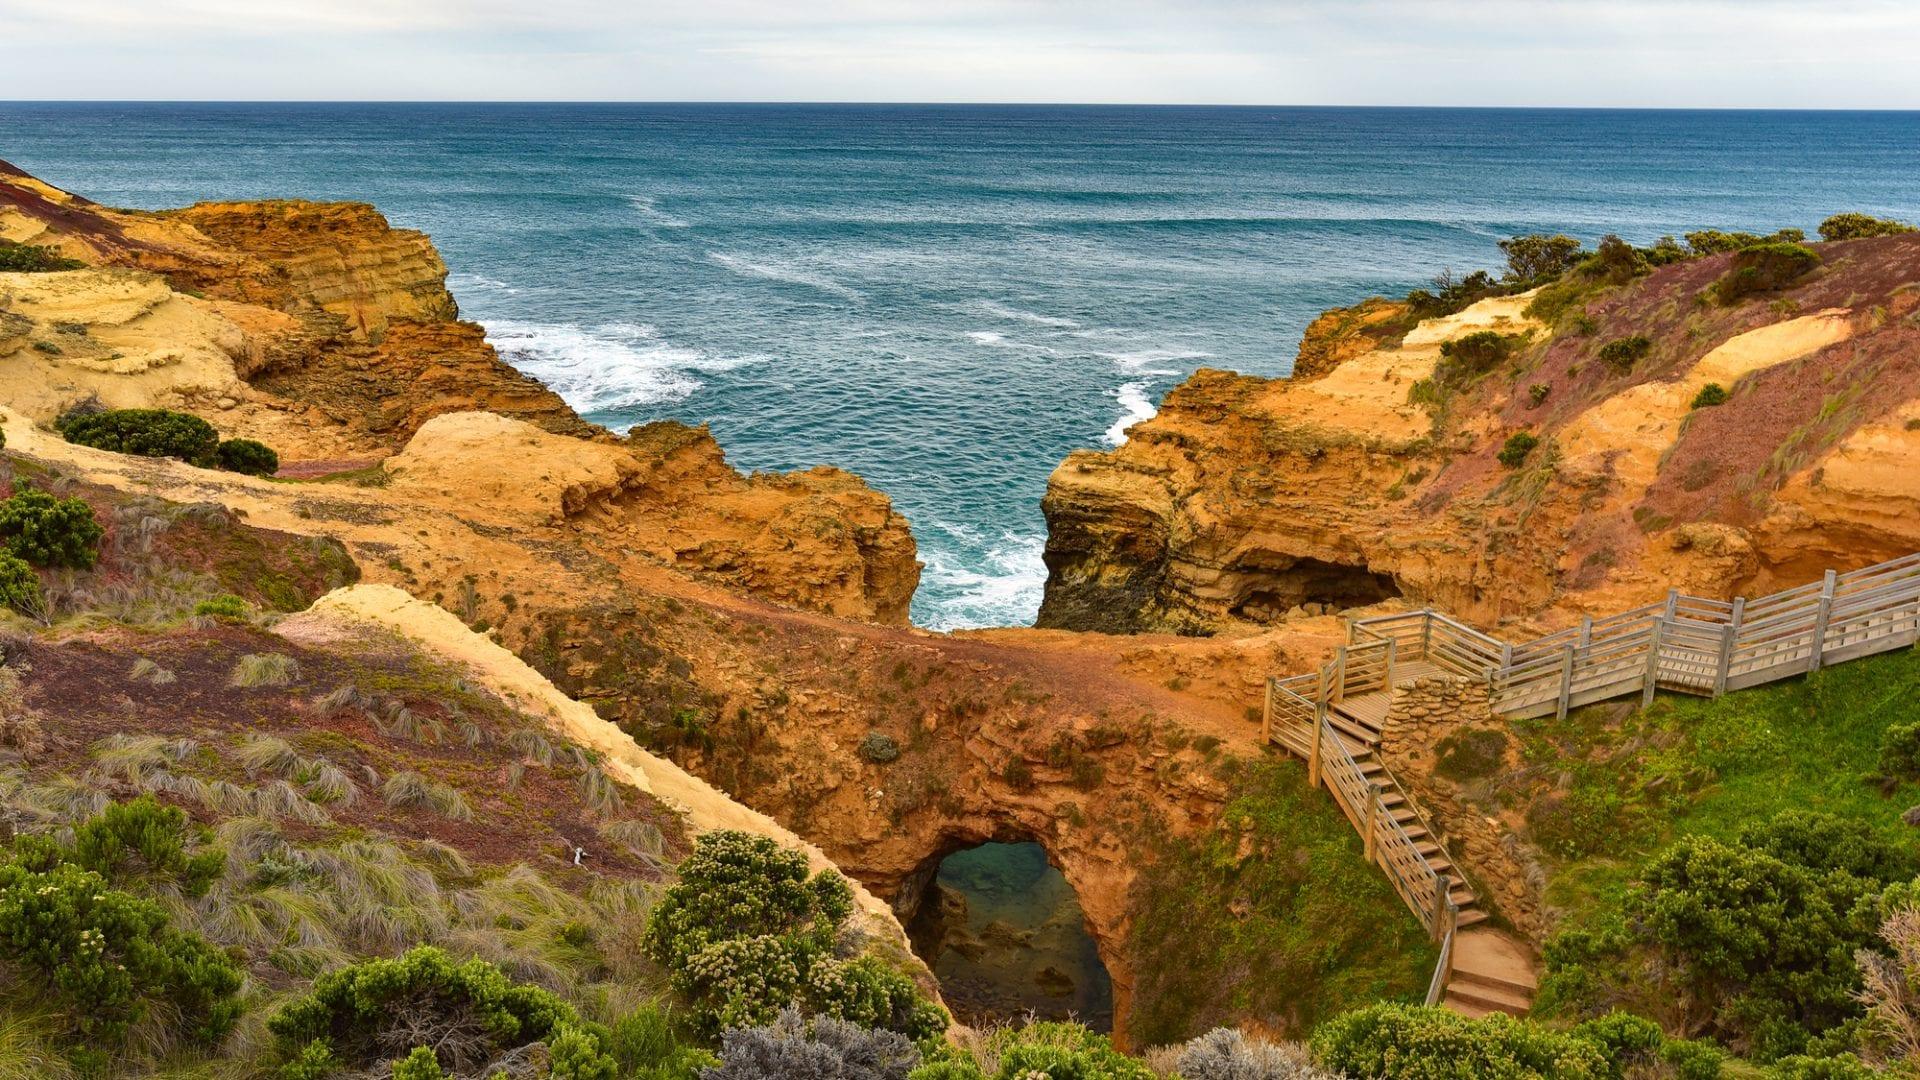 The Grotto Australia